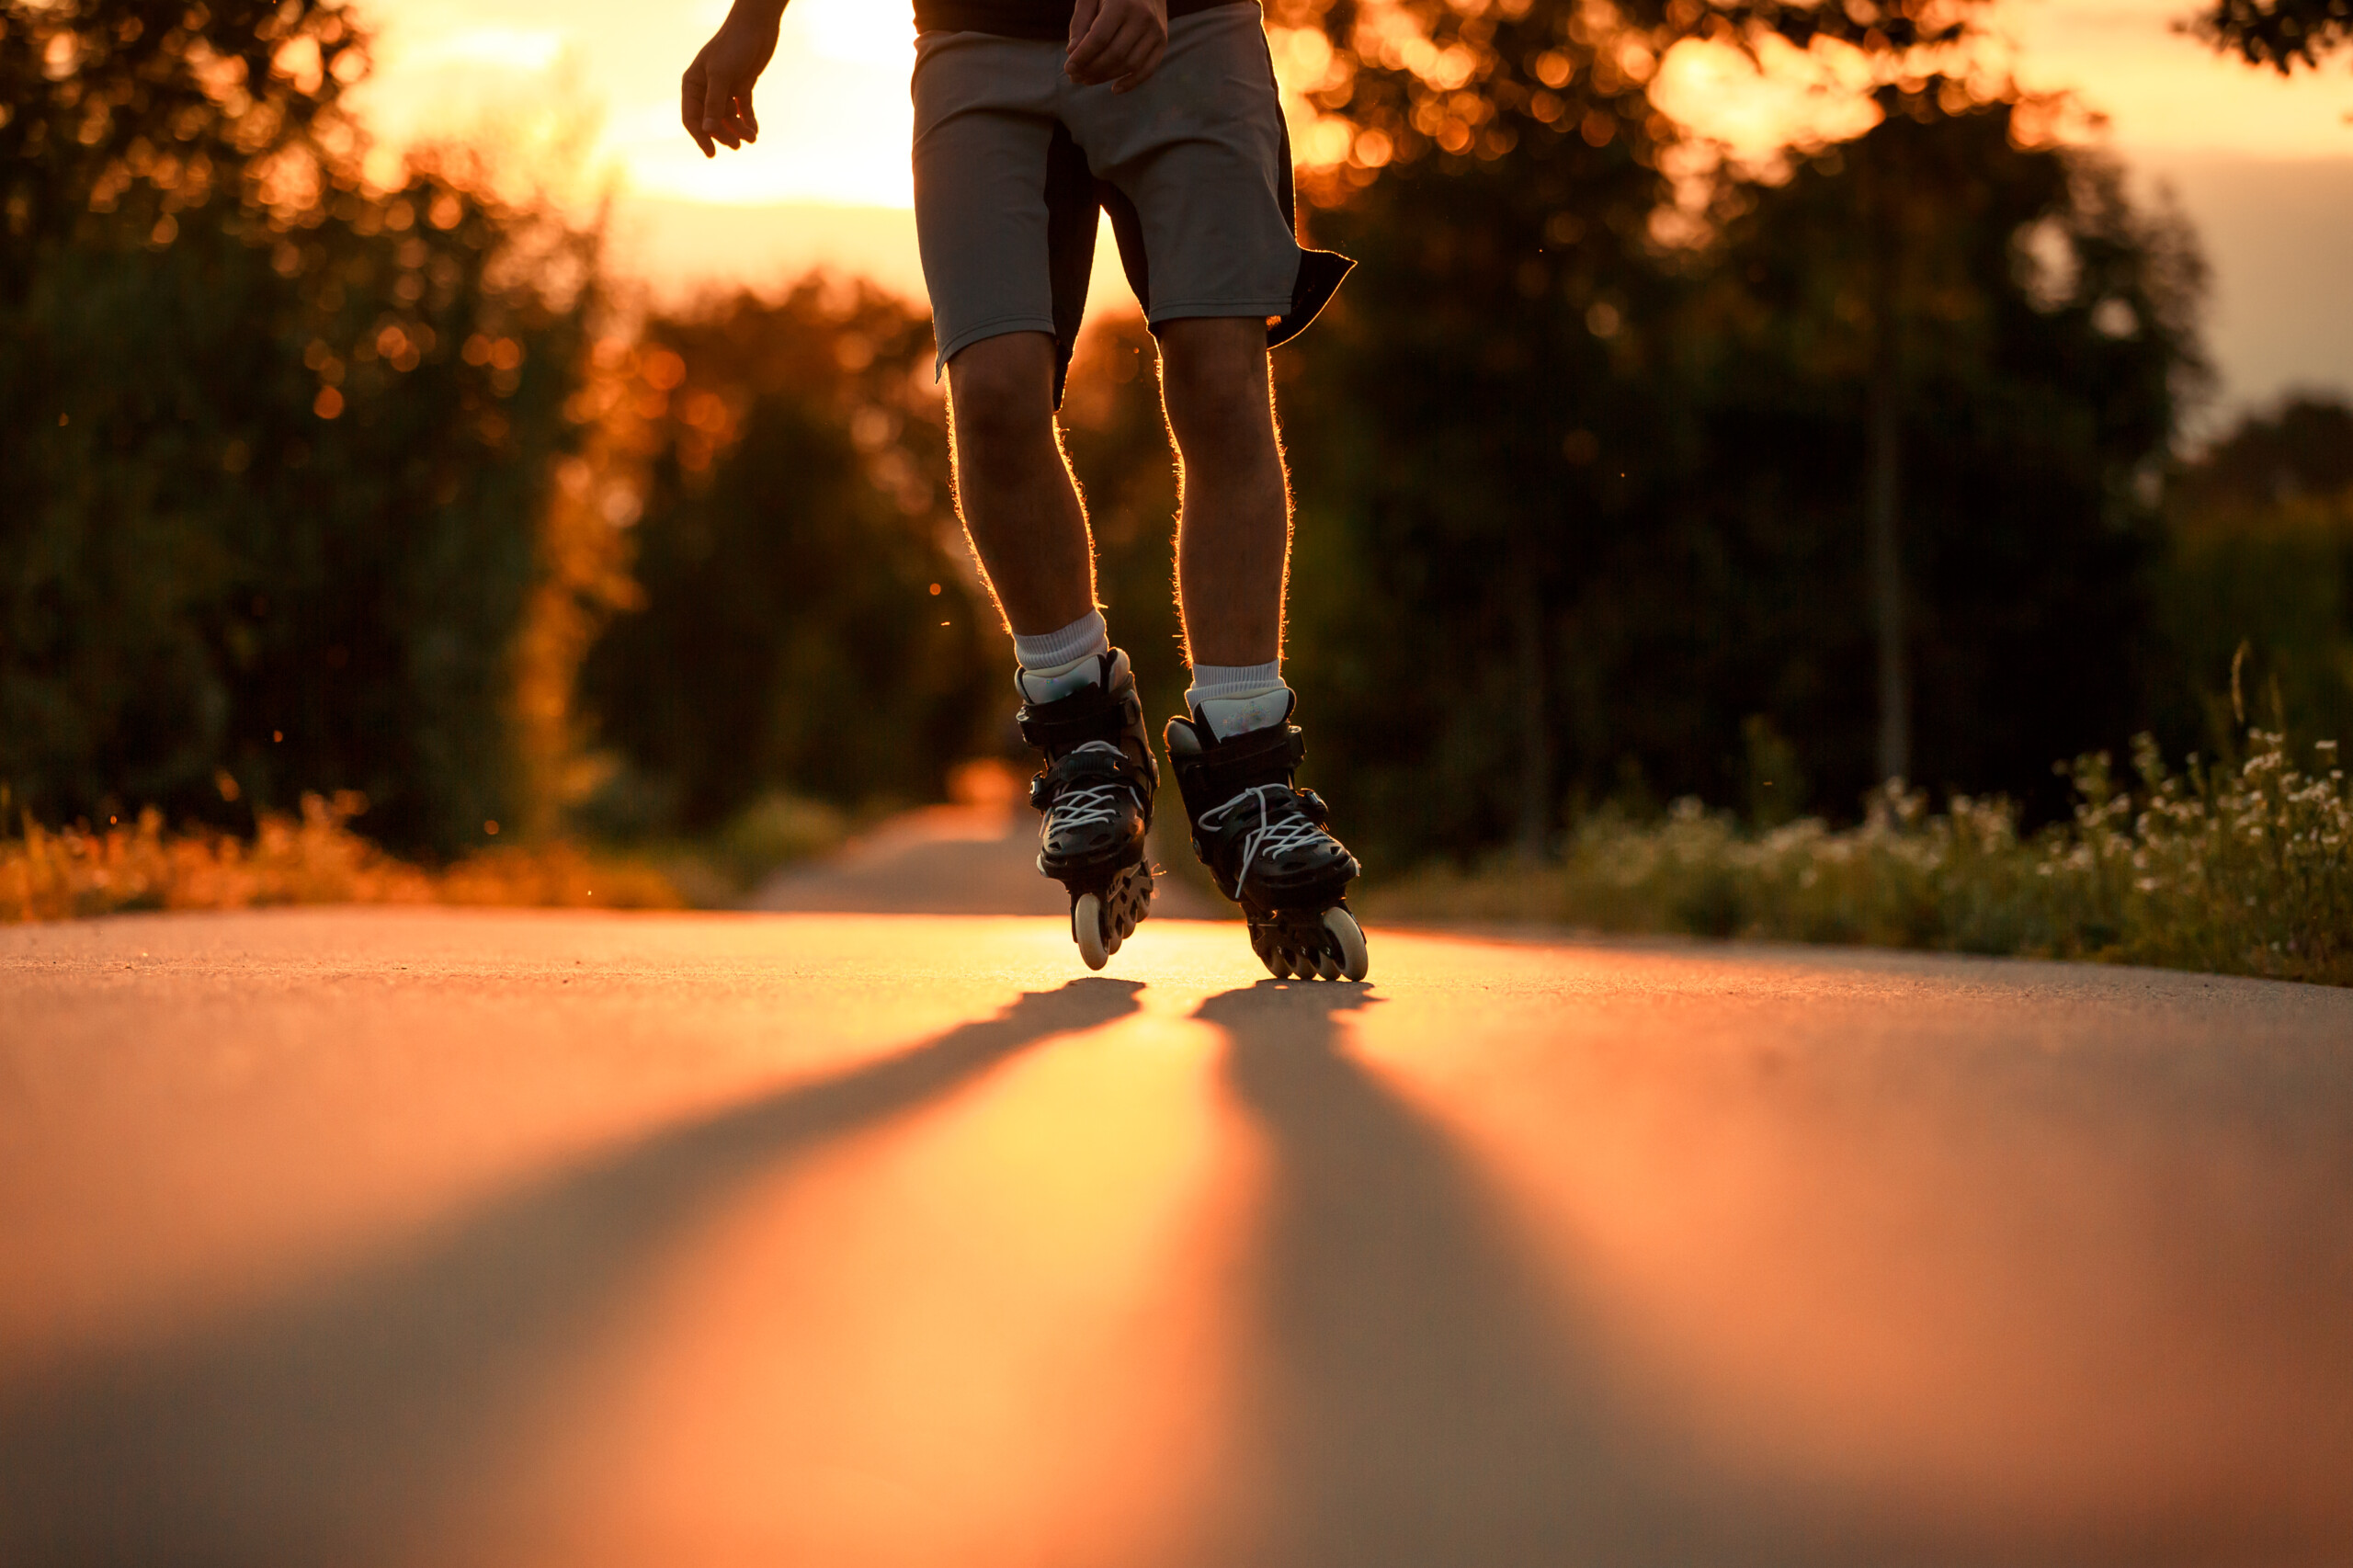 Young man on the roller skates during lovely summer sunset, sport concept, roller skating